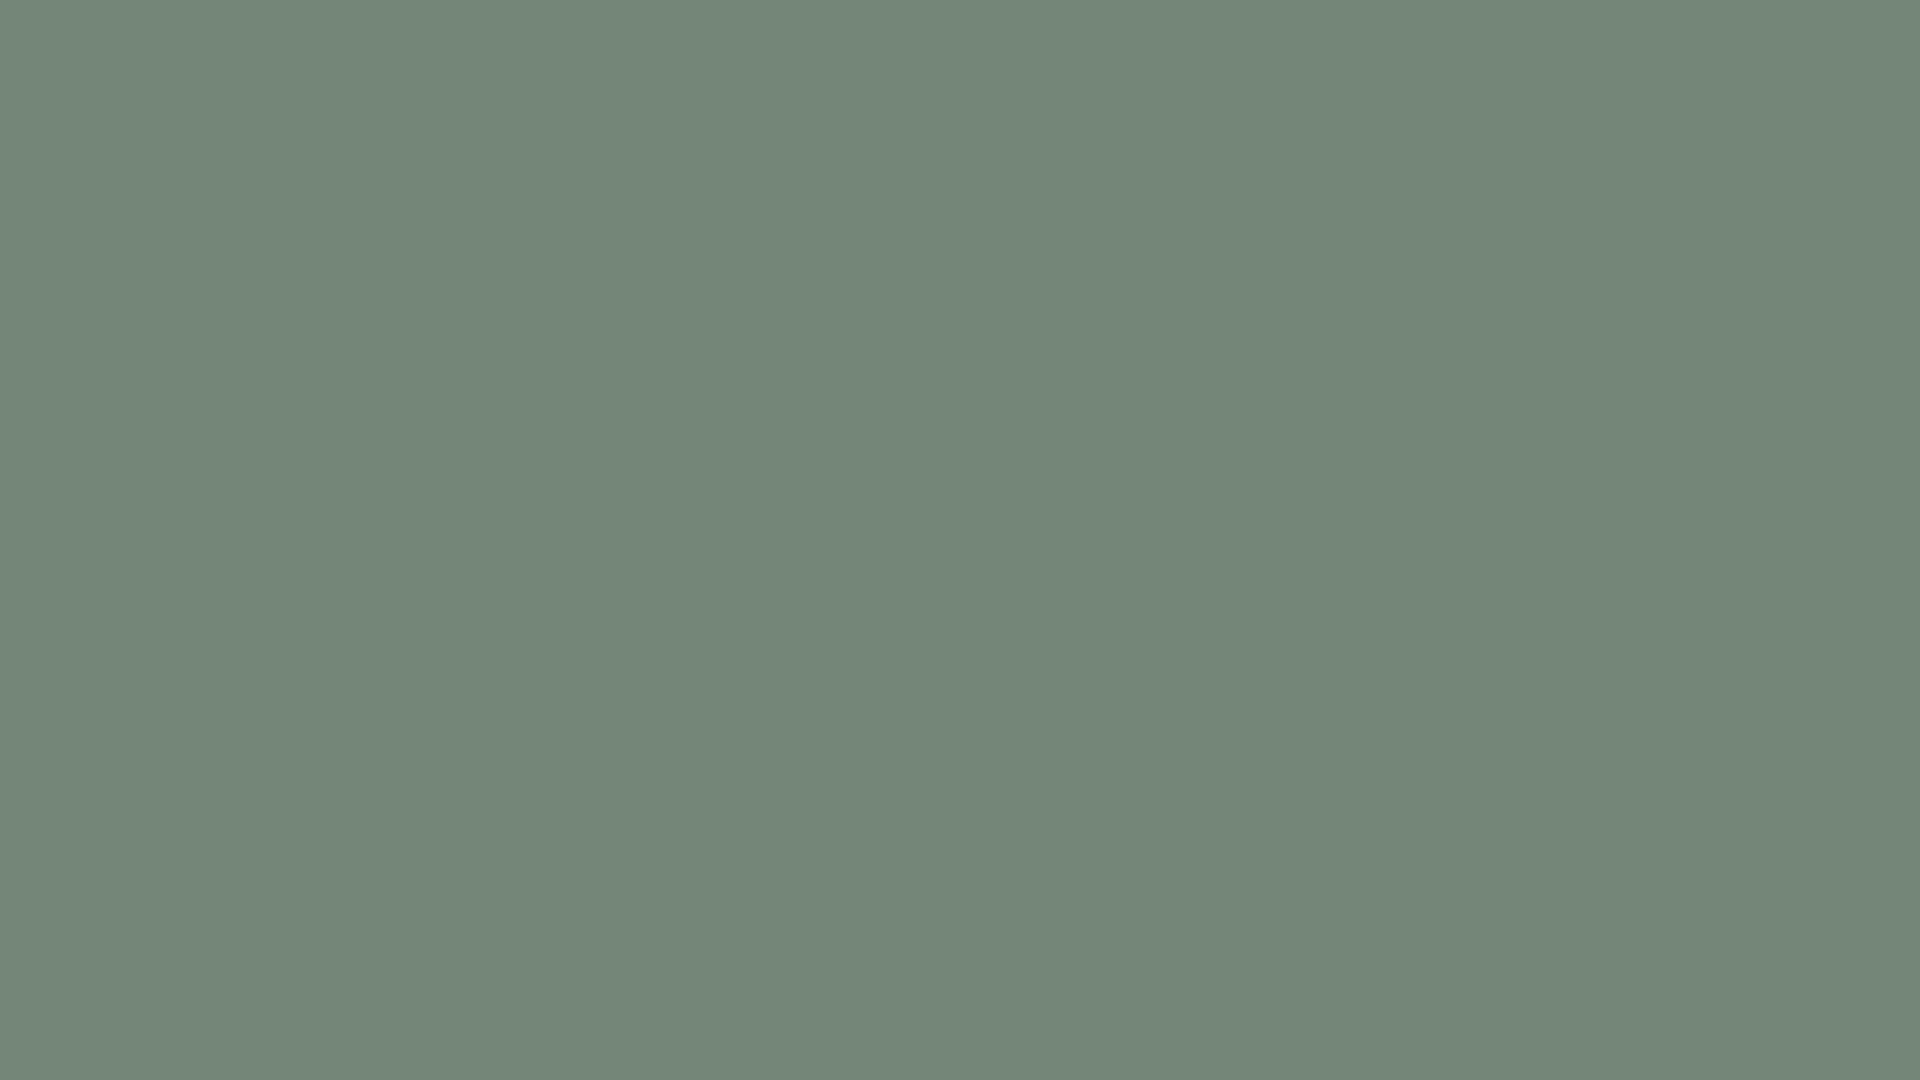 1920x1080 Xanadu Solid Color Background